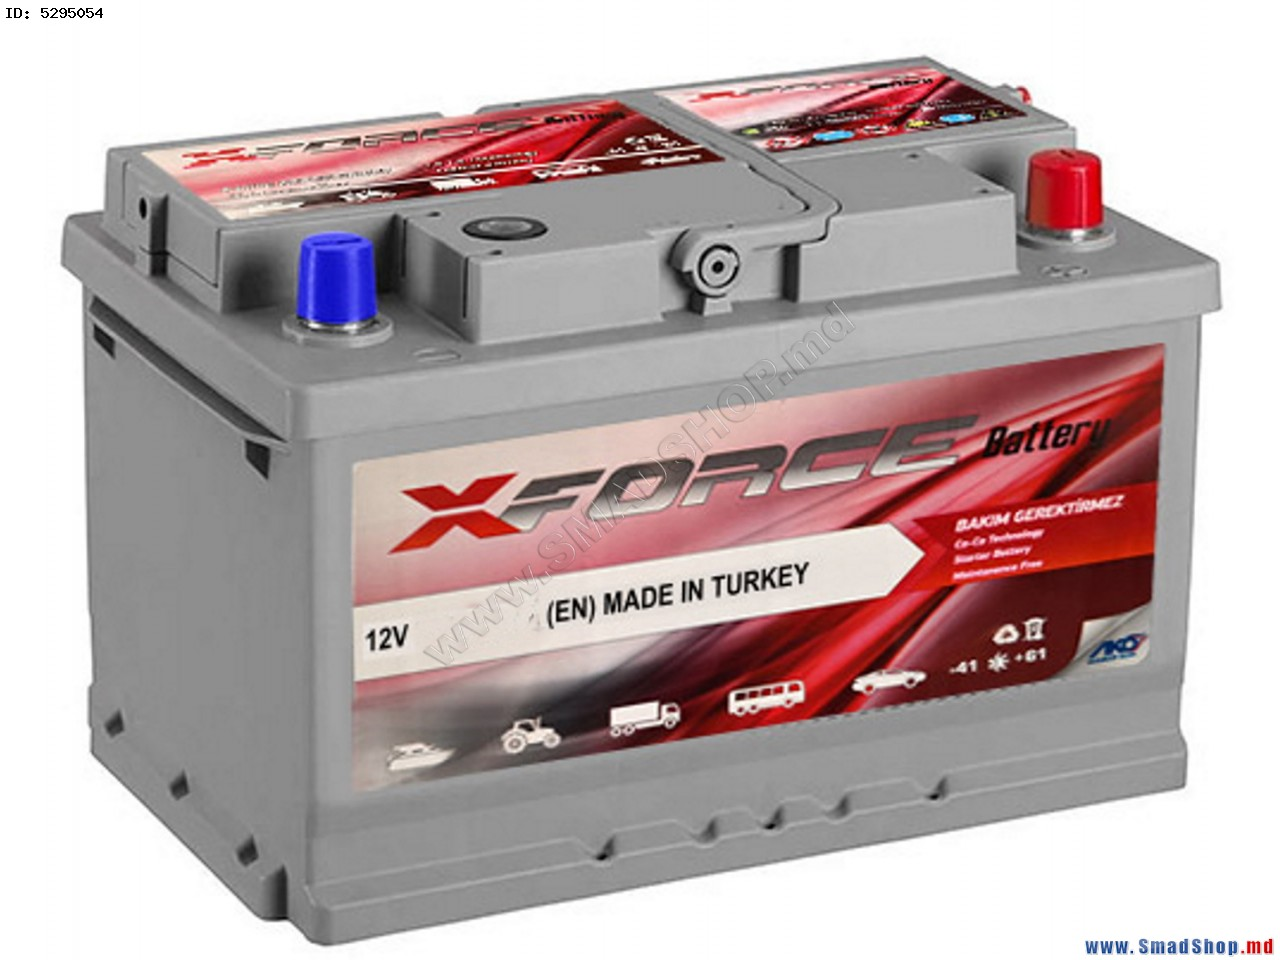 Аккумулятор 12V 60Ah Xforce photo